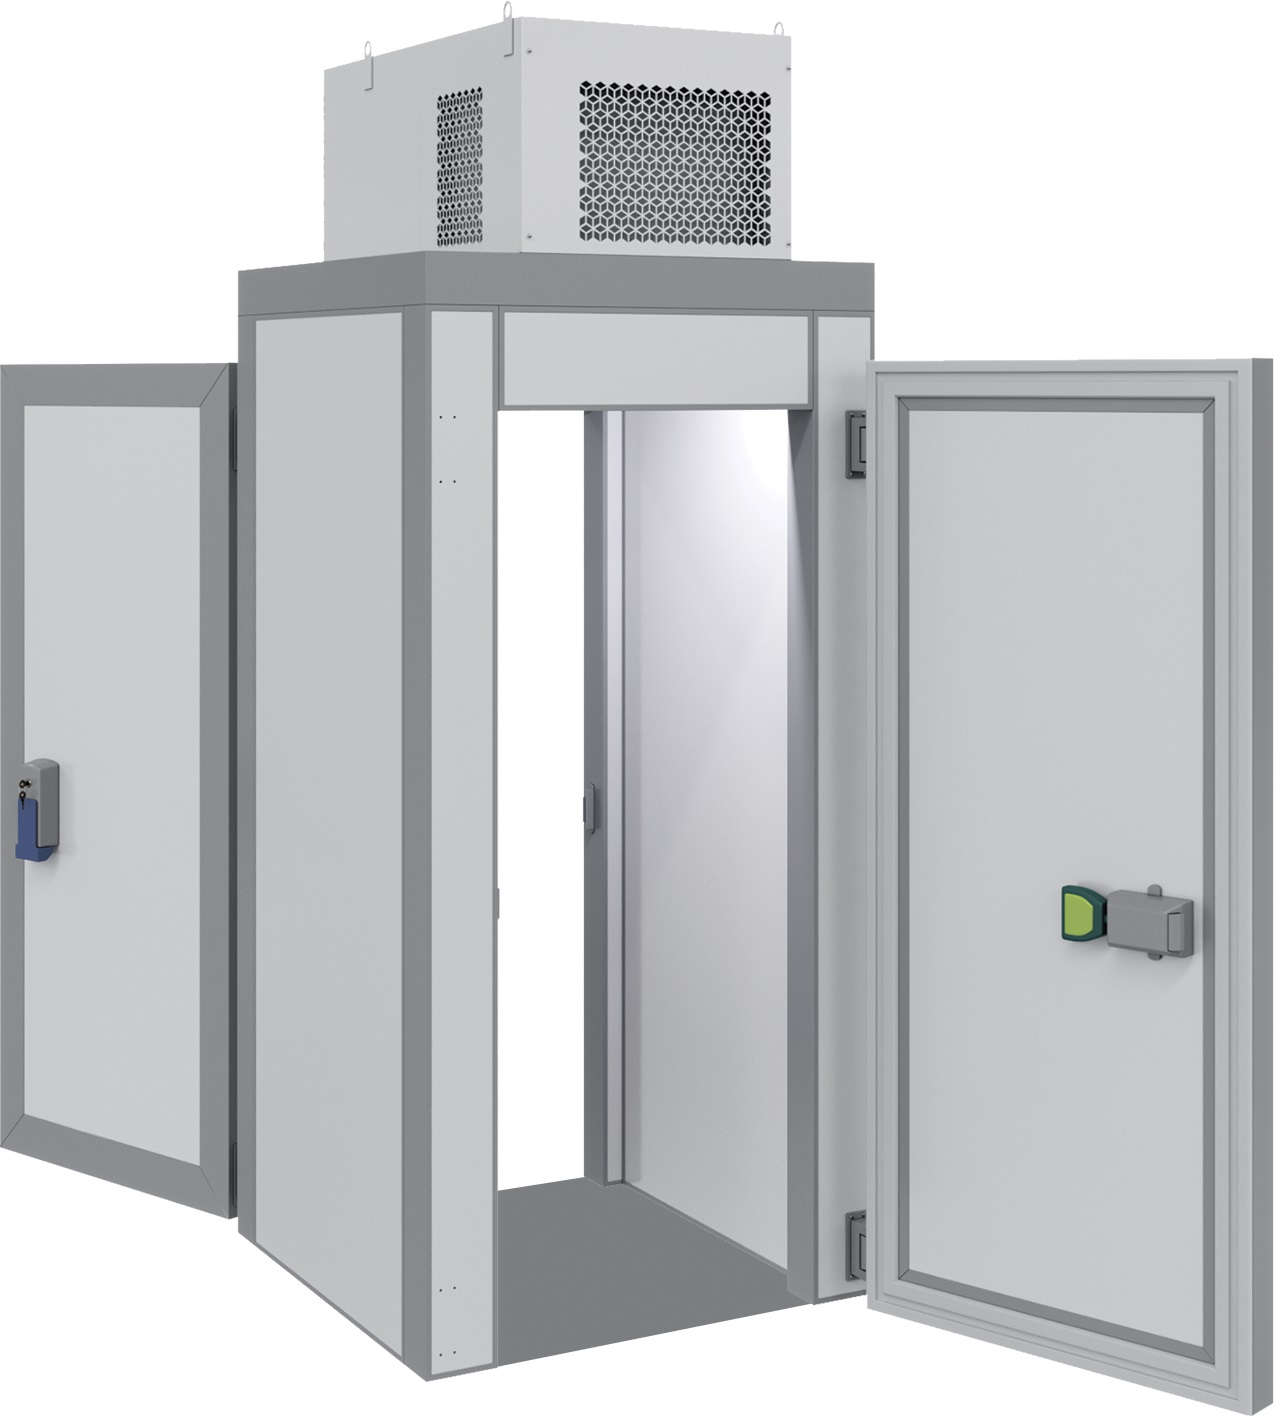 Холодильная миникамера Полаир КХН-1,28 Minicella ММ 2 двери